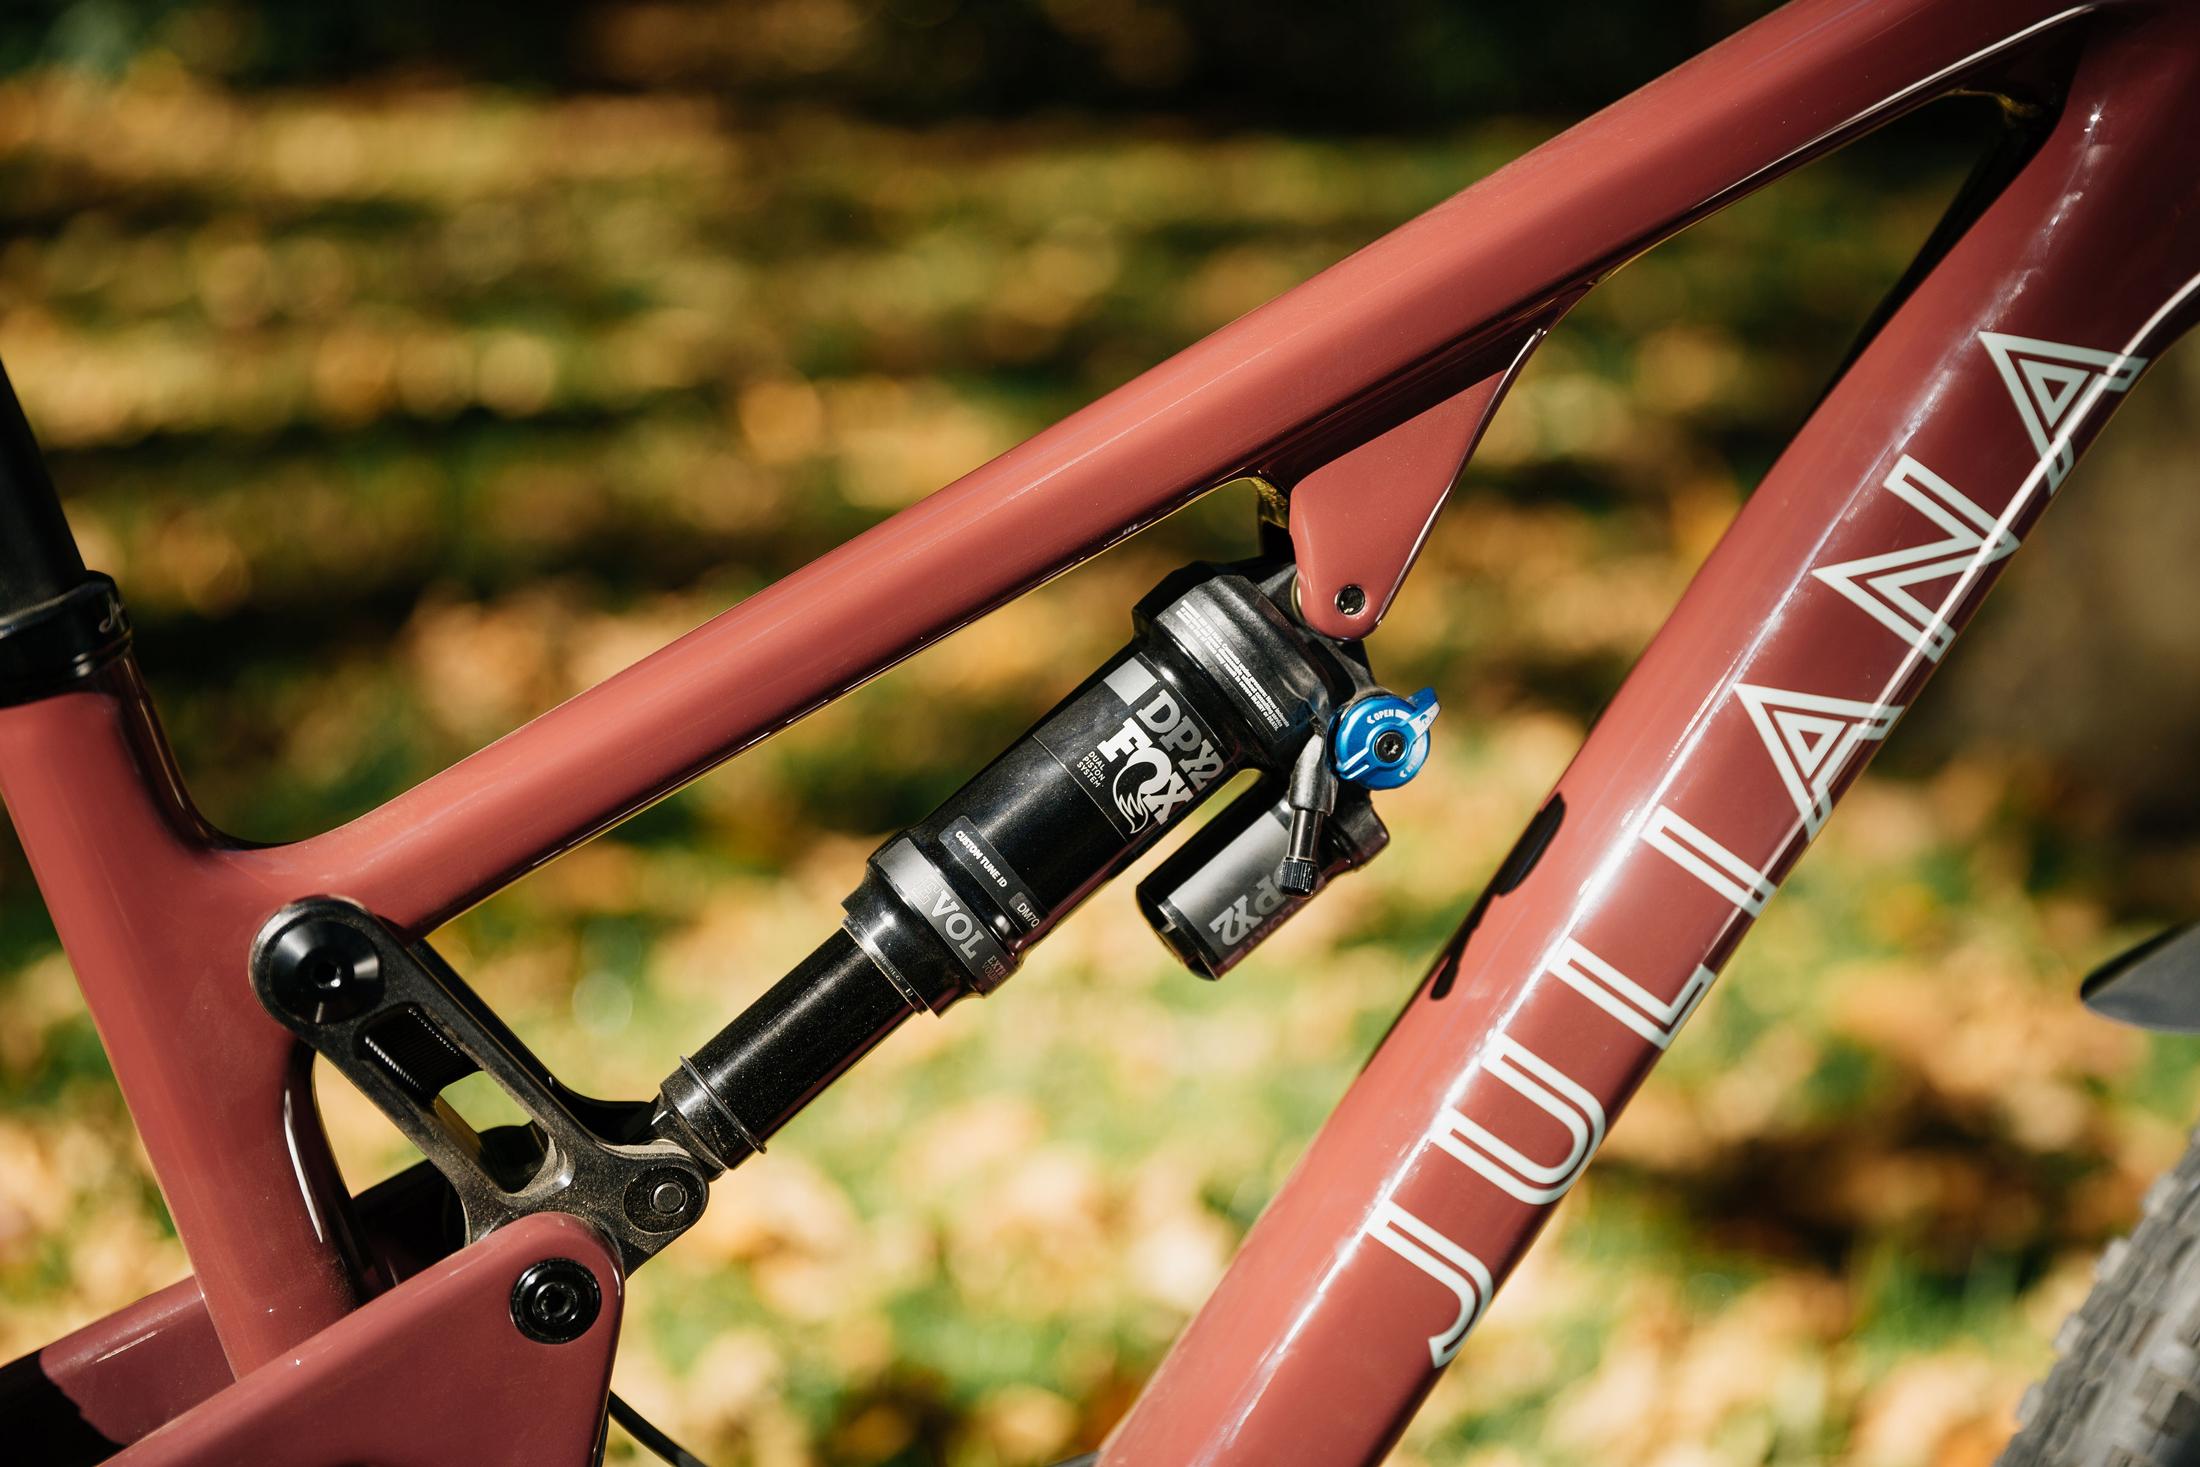 mountain bike rear suspension